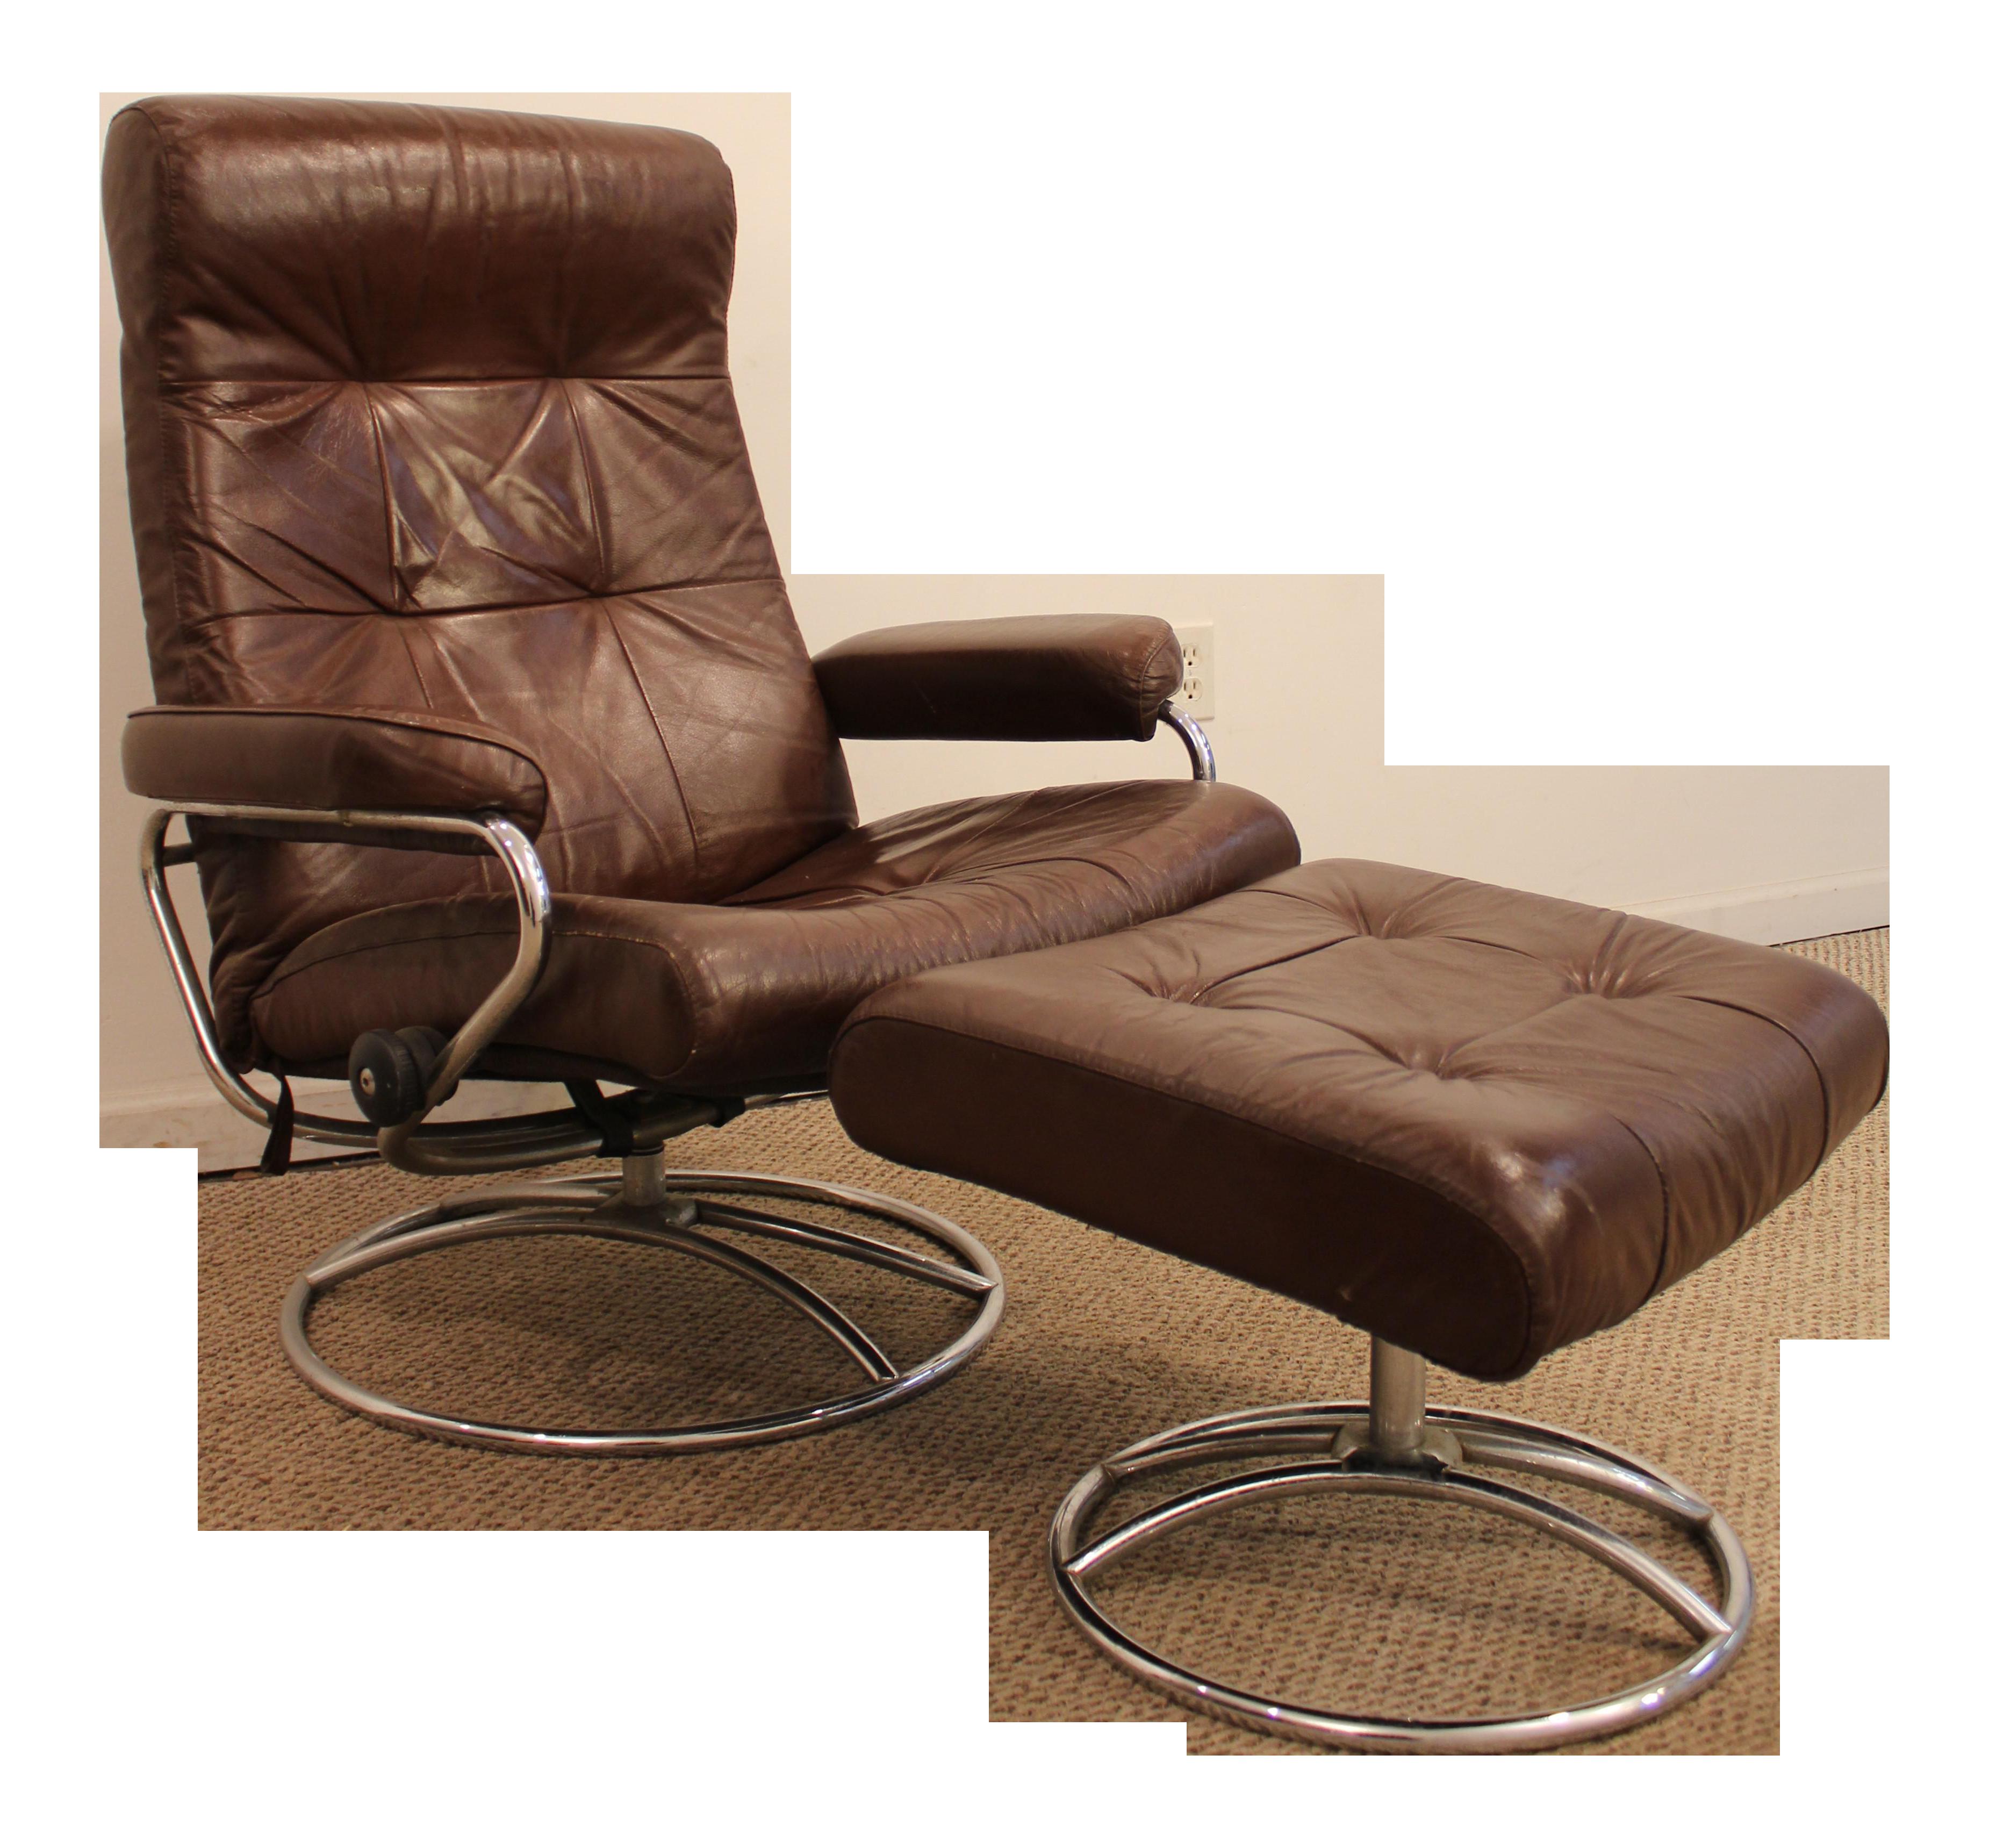 Ekornes Stressless Mid-Century Danish Modern Leather Chrome Recliner Lounge Chair u0026 Ottoman  sc 1 st  Chairish & Ekornes Stressless Mid-Century Danish Modern Leather Chrome Recliner ...